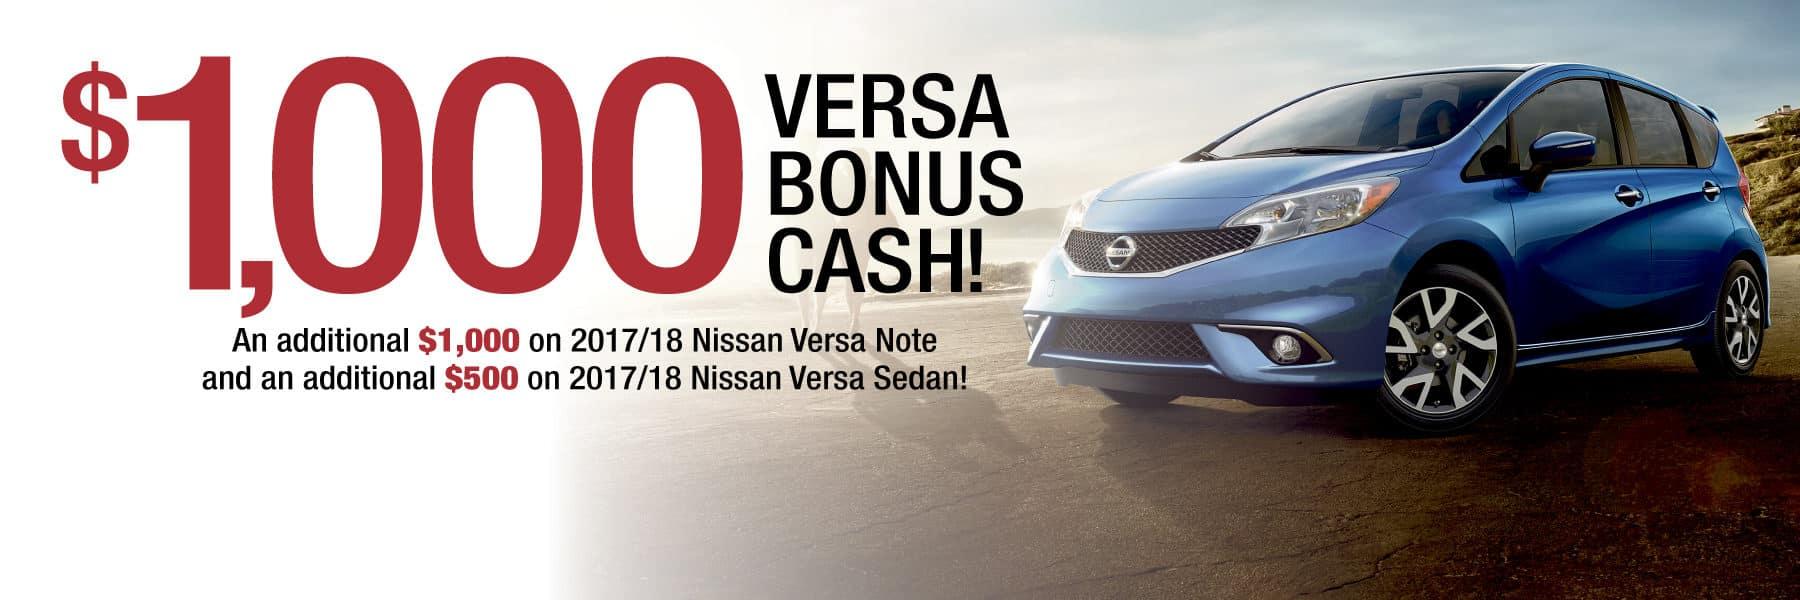 Up to $1,000 Nissan Bonus Cash on Nissan Versa!